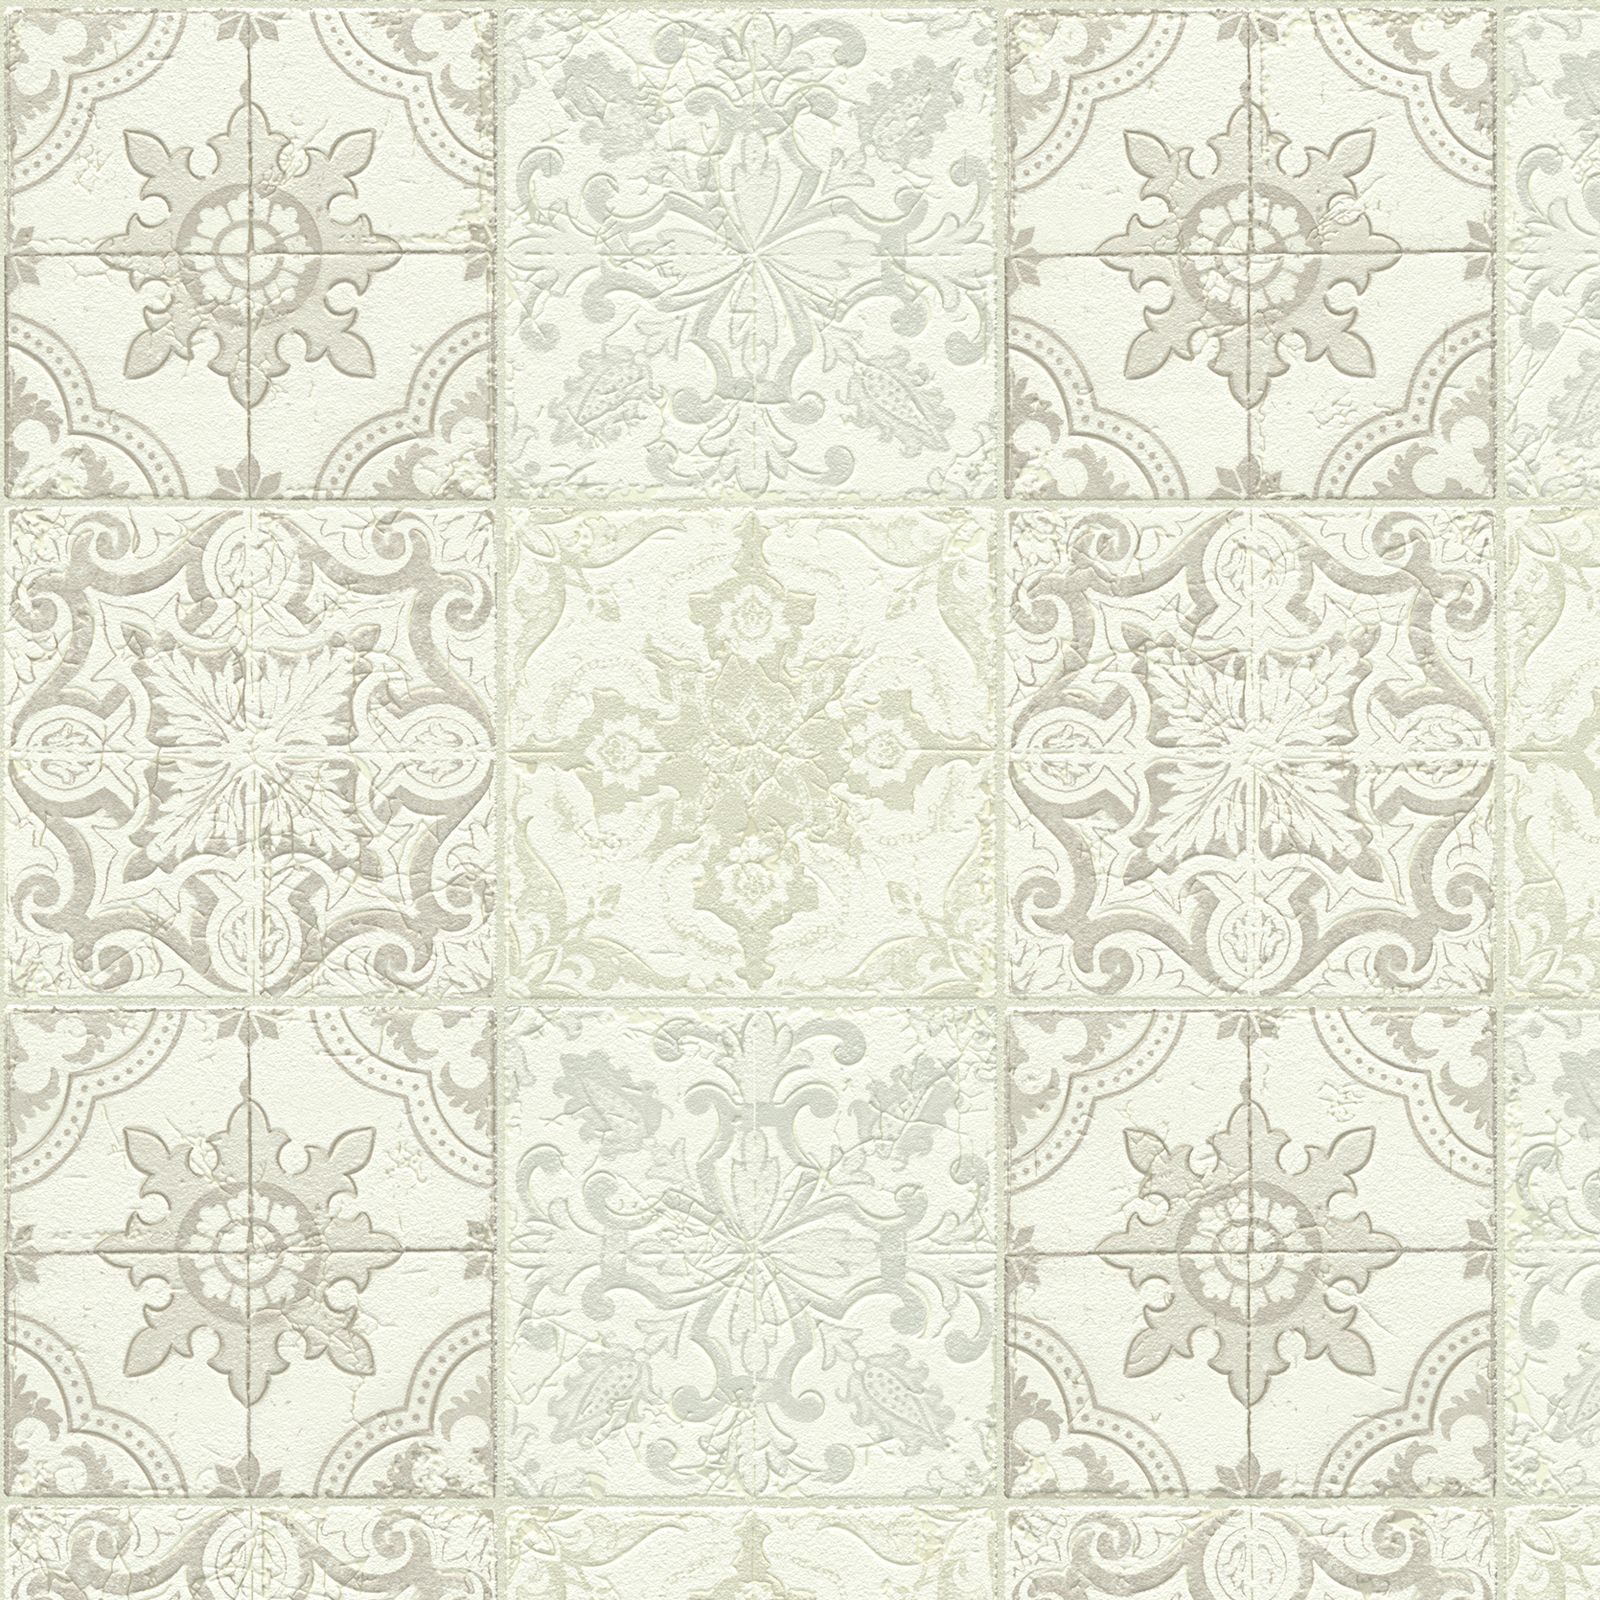 chatsworth beige cream white mosaic tile wallpaper. Black Bedroom Furniture Sets. Home Design Ideas